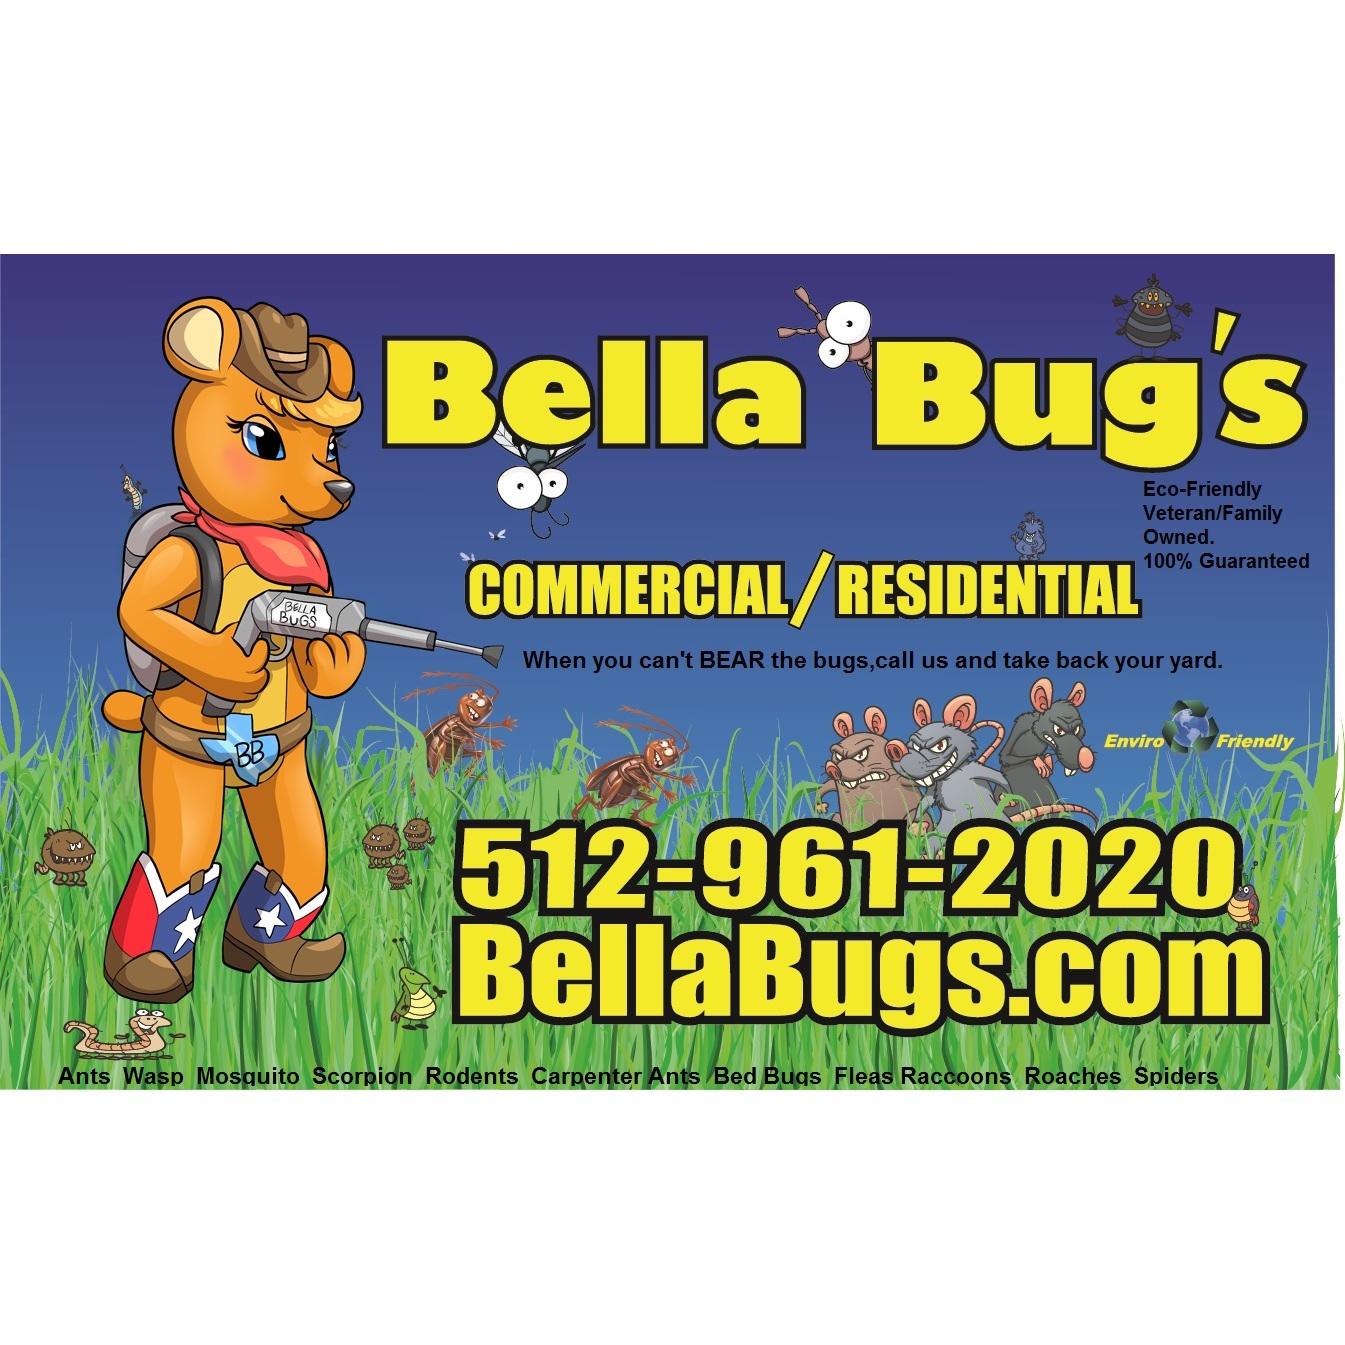 Bella Bugs Pest Control - austin, TX - Pest & Animal Control